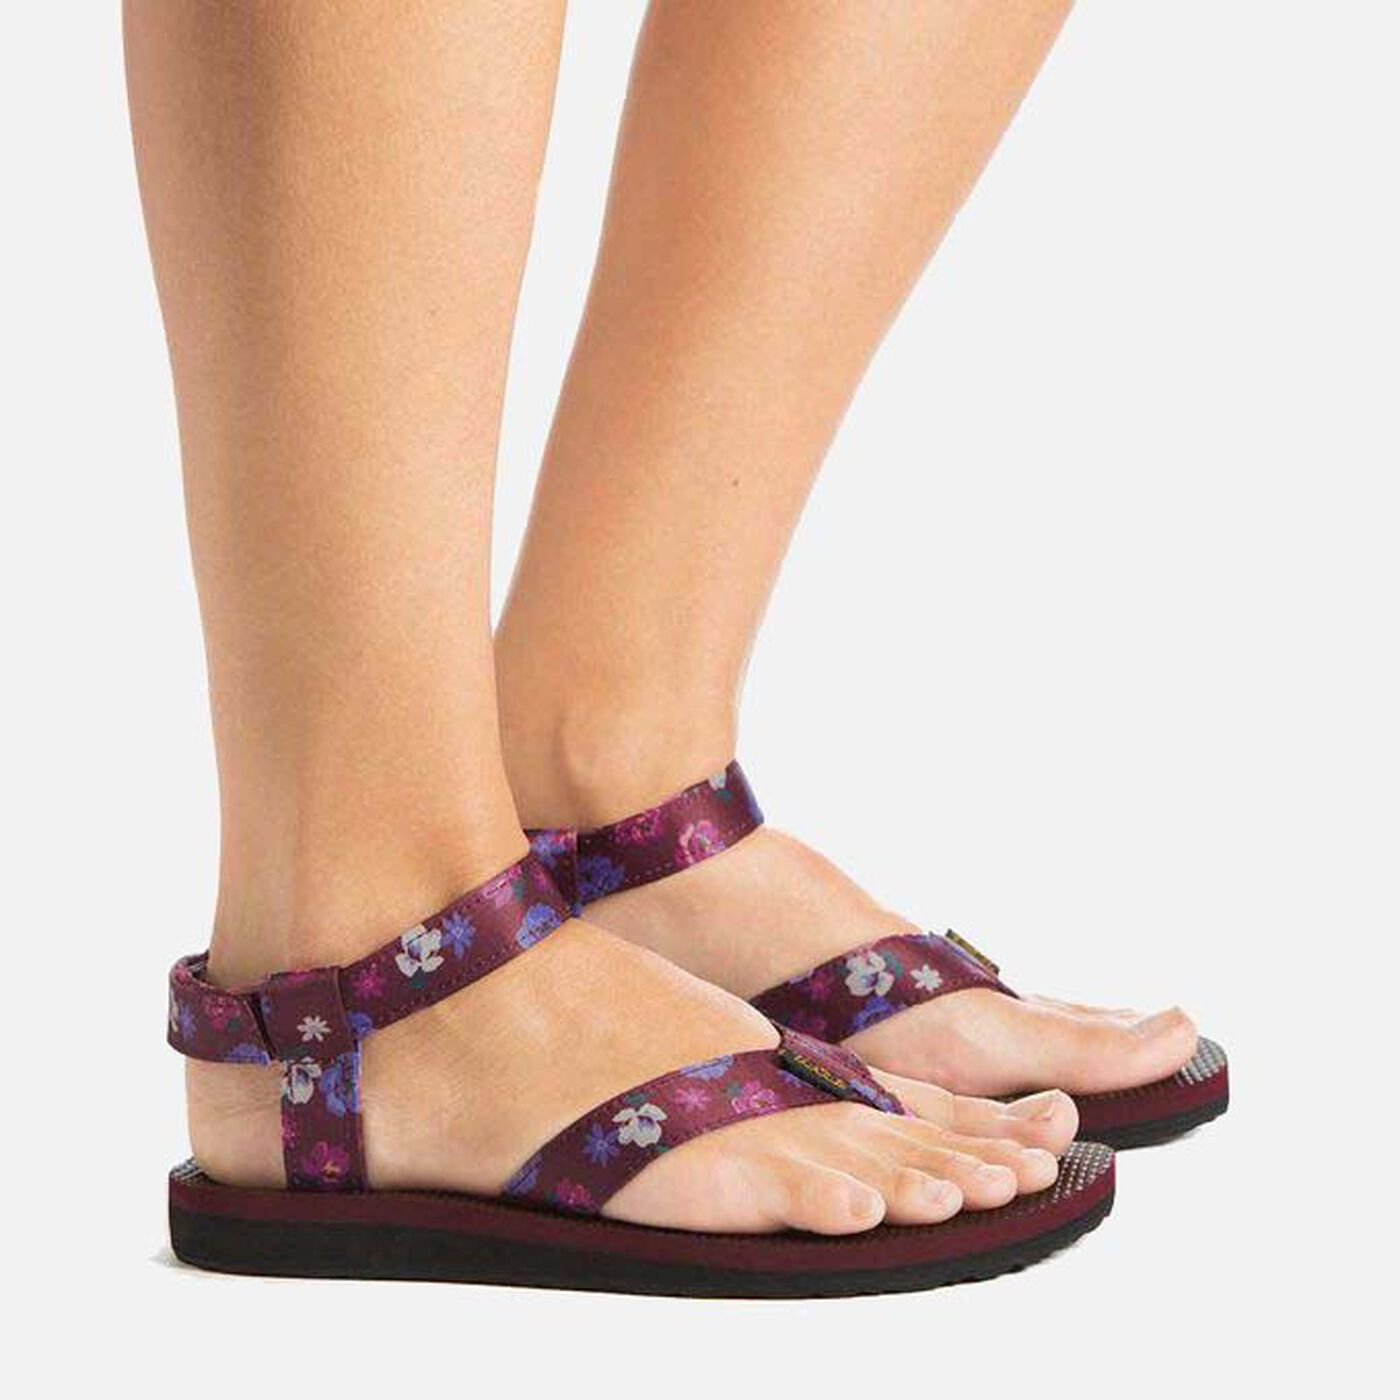 Womens sandals canada online - Women S Original Sandal Floral Satin